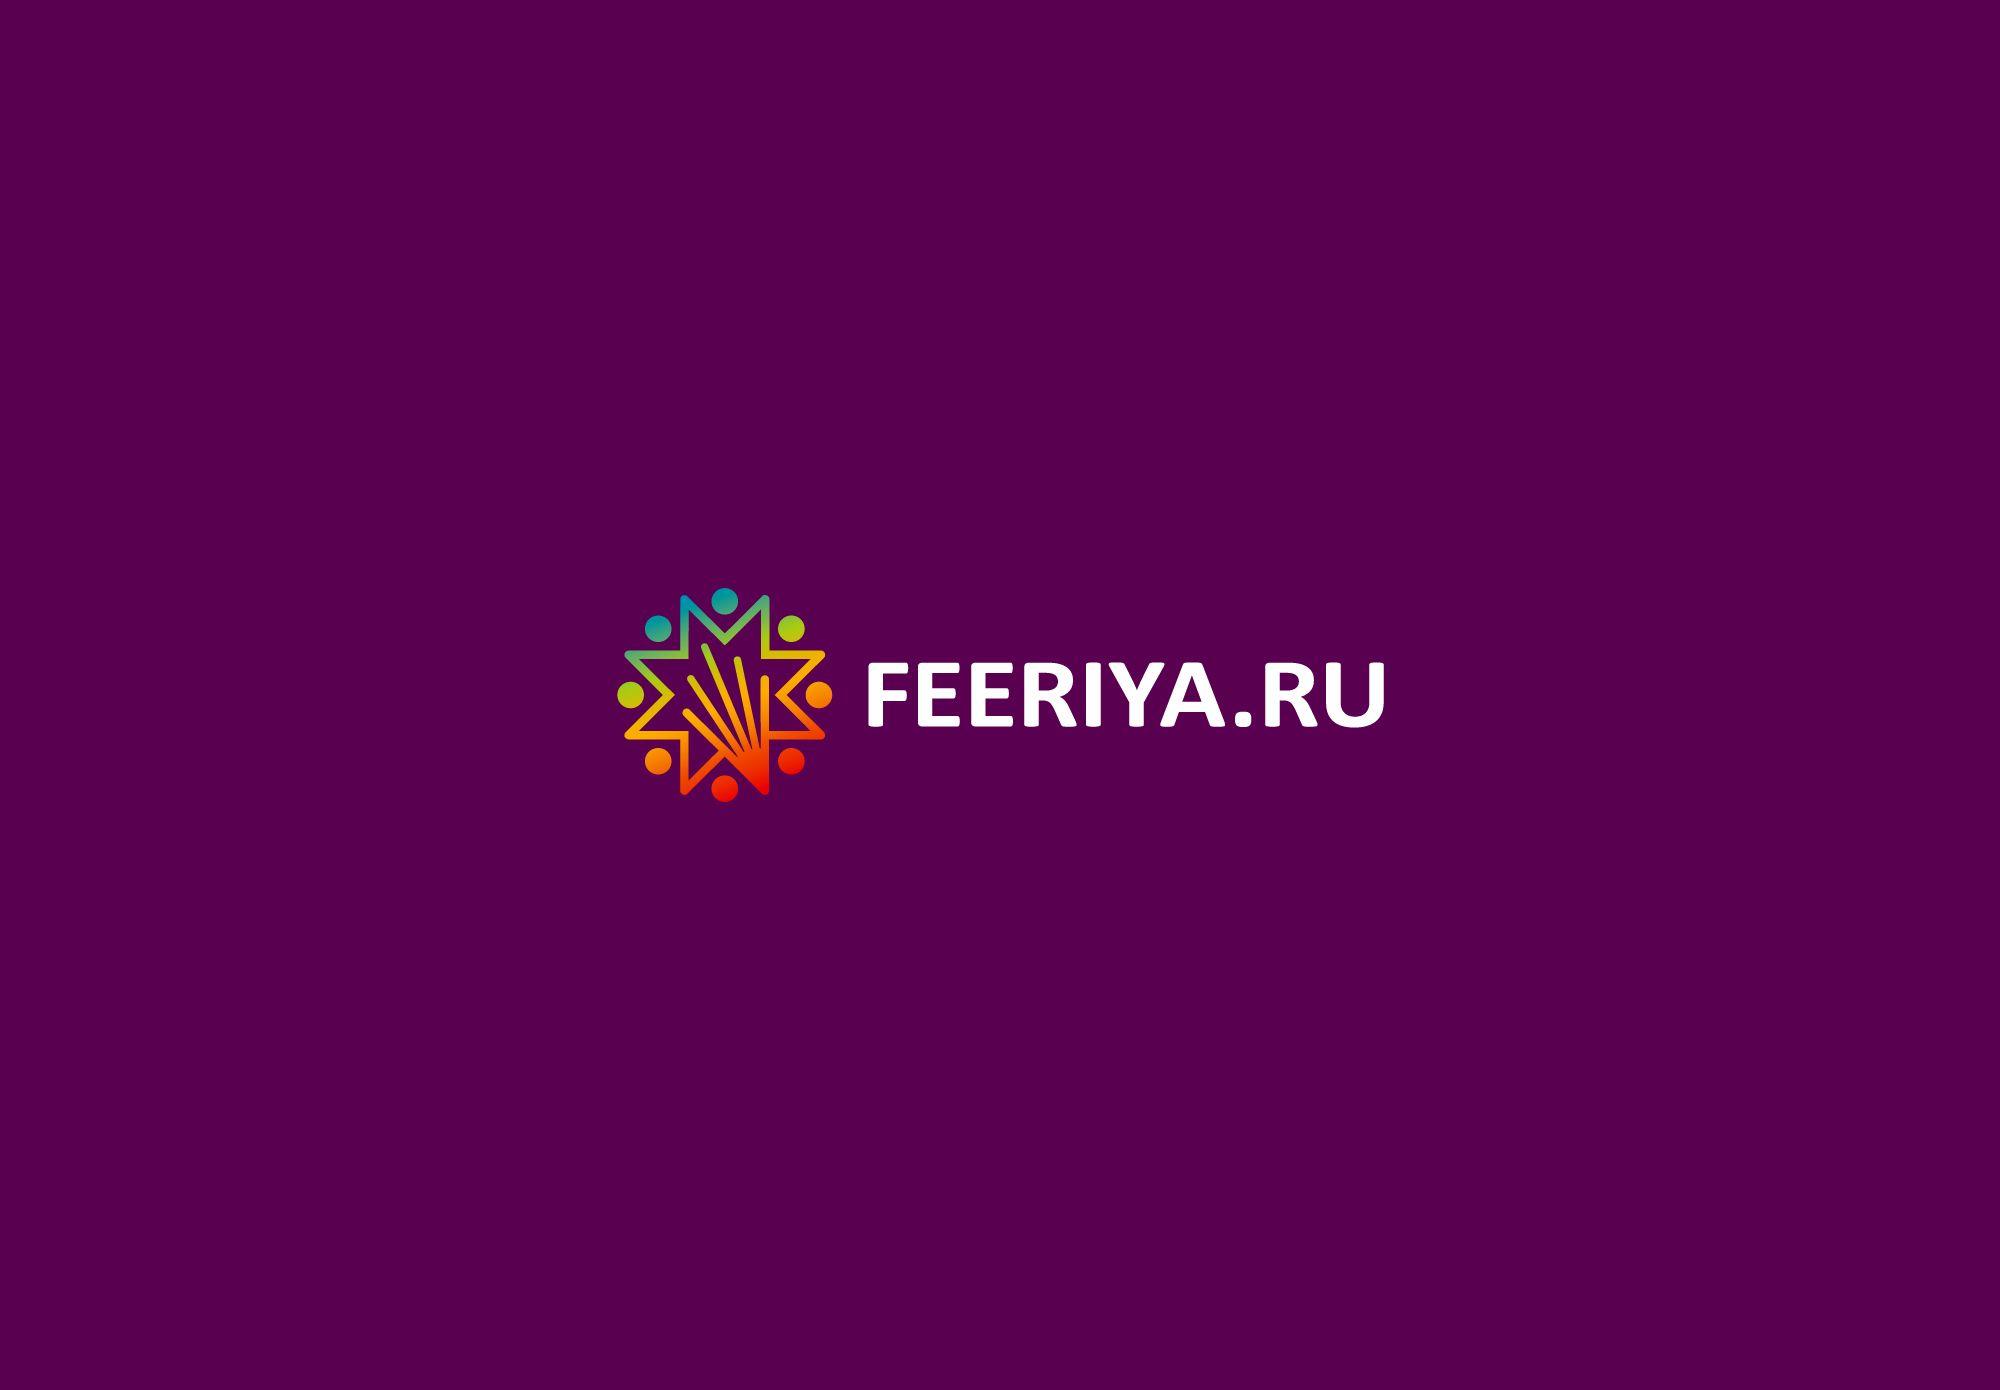 Логотип для feeriya.ru - дизайнер shamaevserg